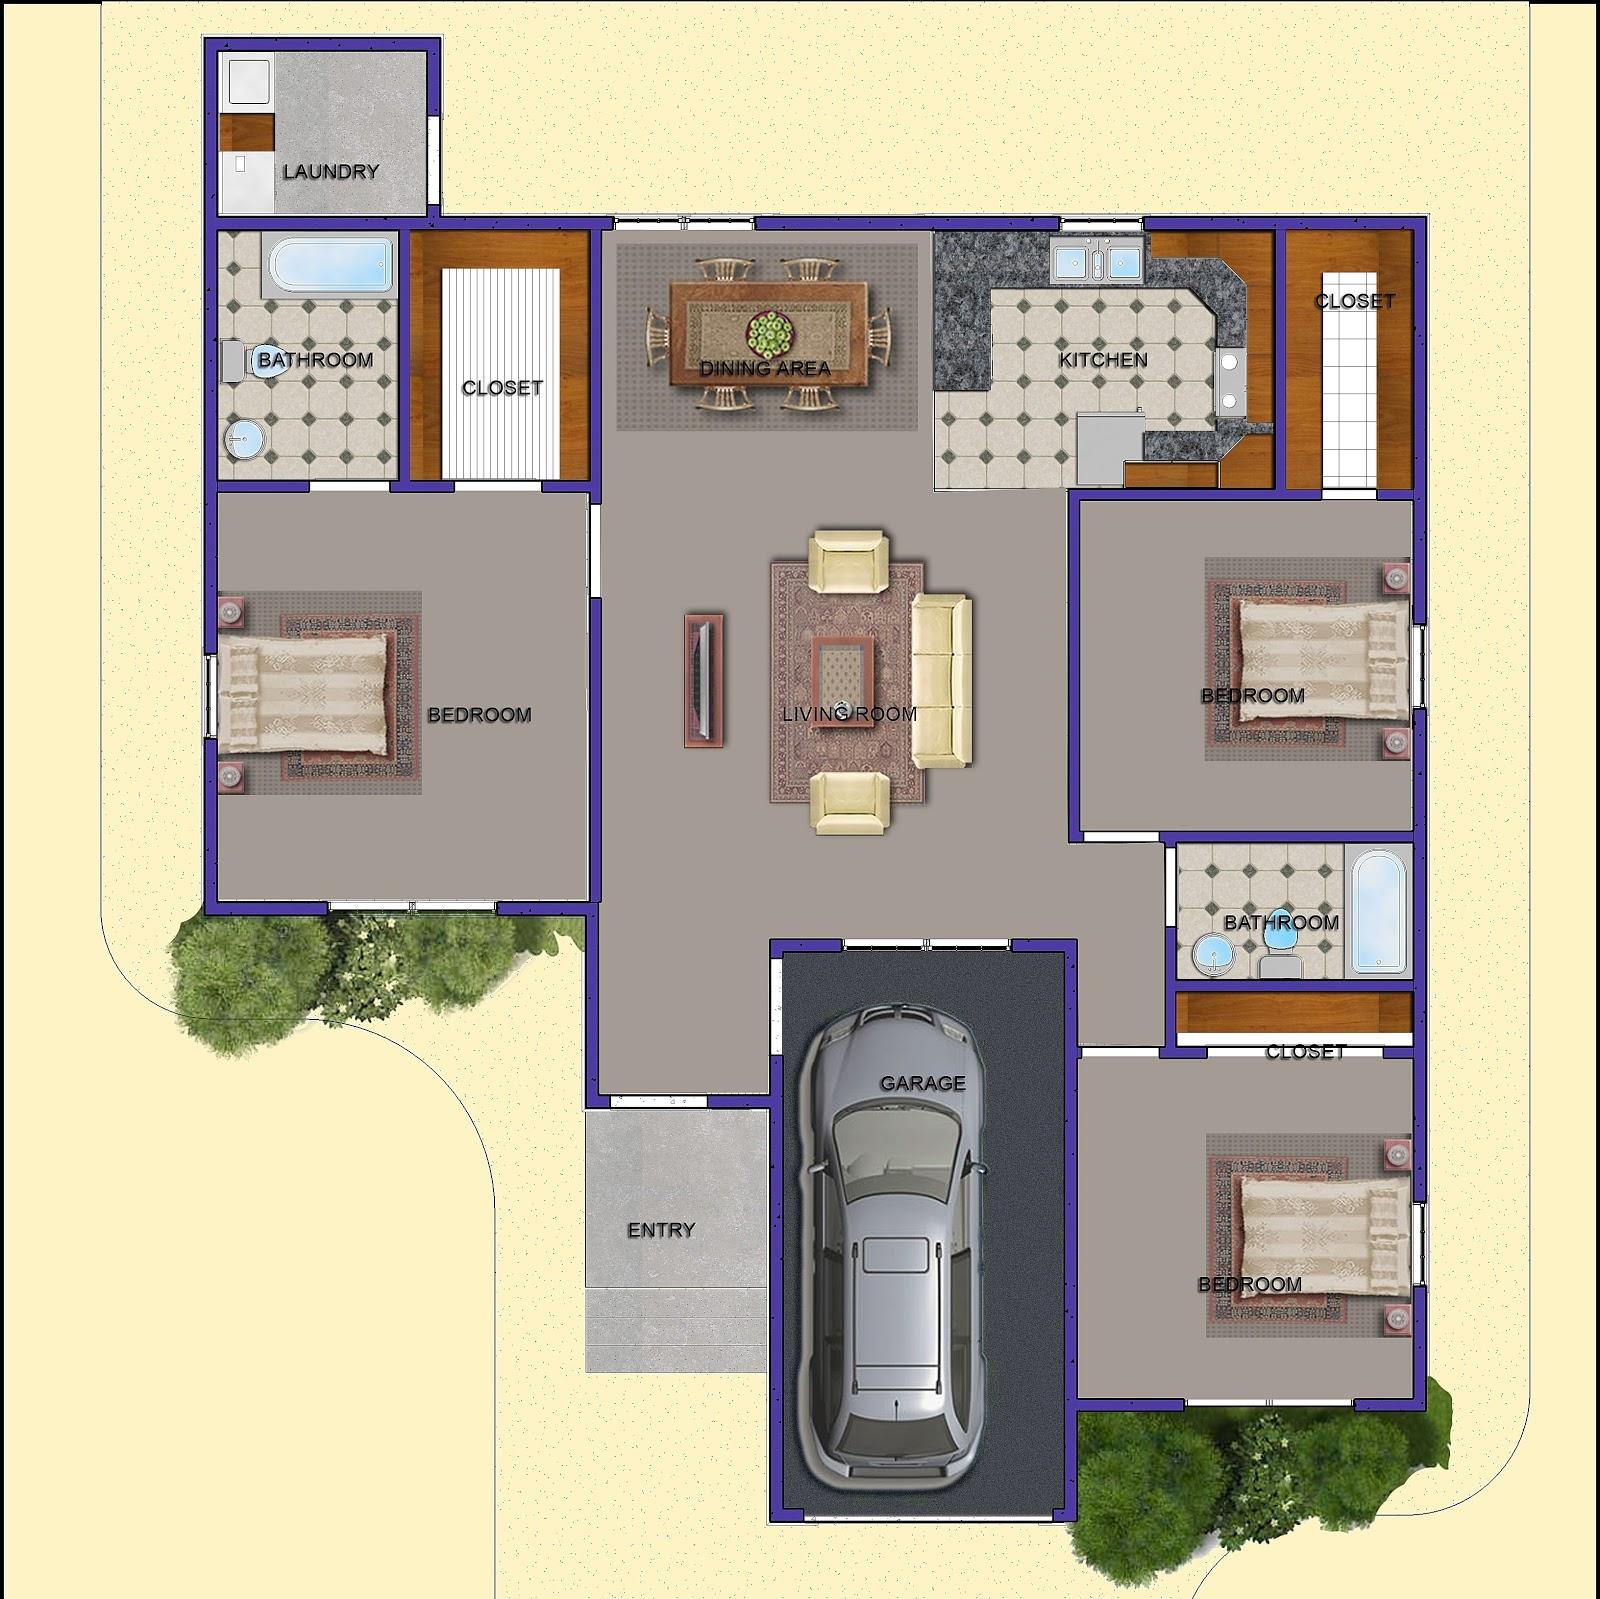 Goodir Somali Import Export Education: 3 Bedroom Home Plan